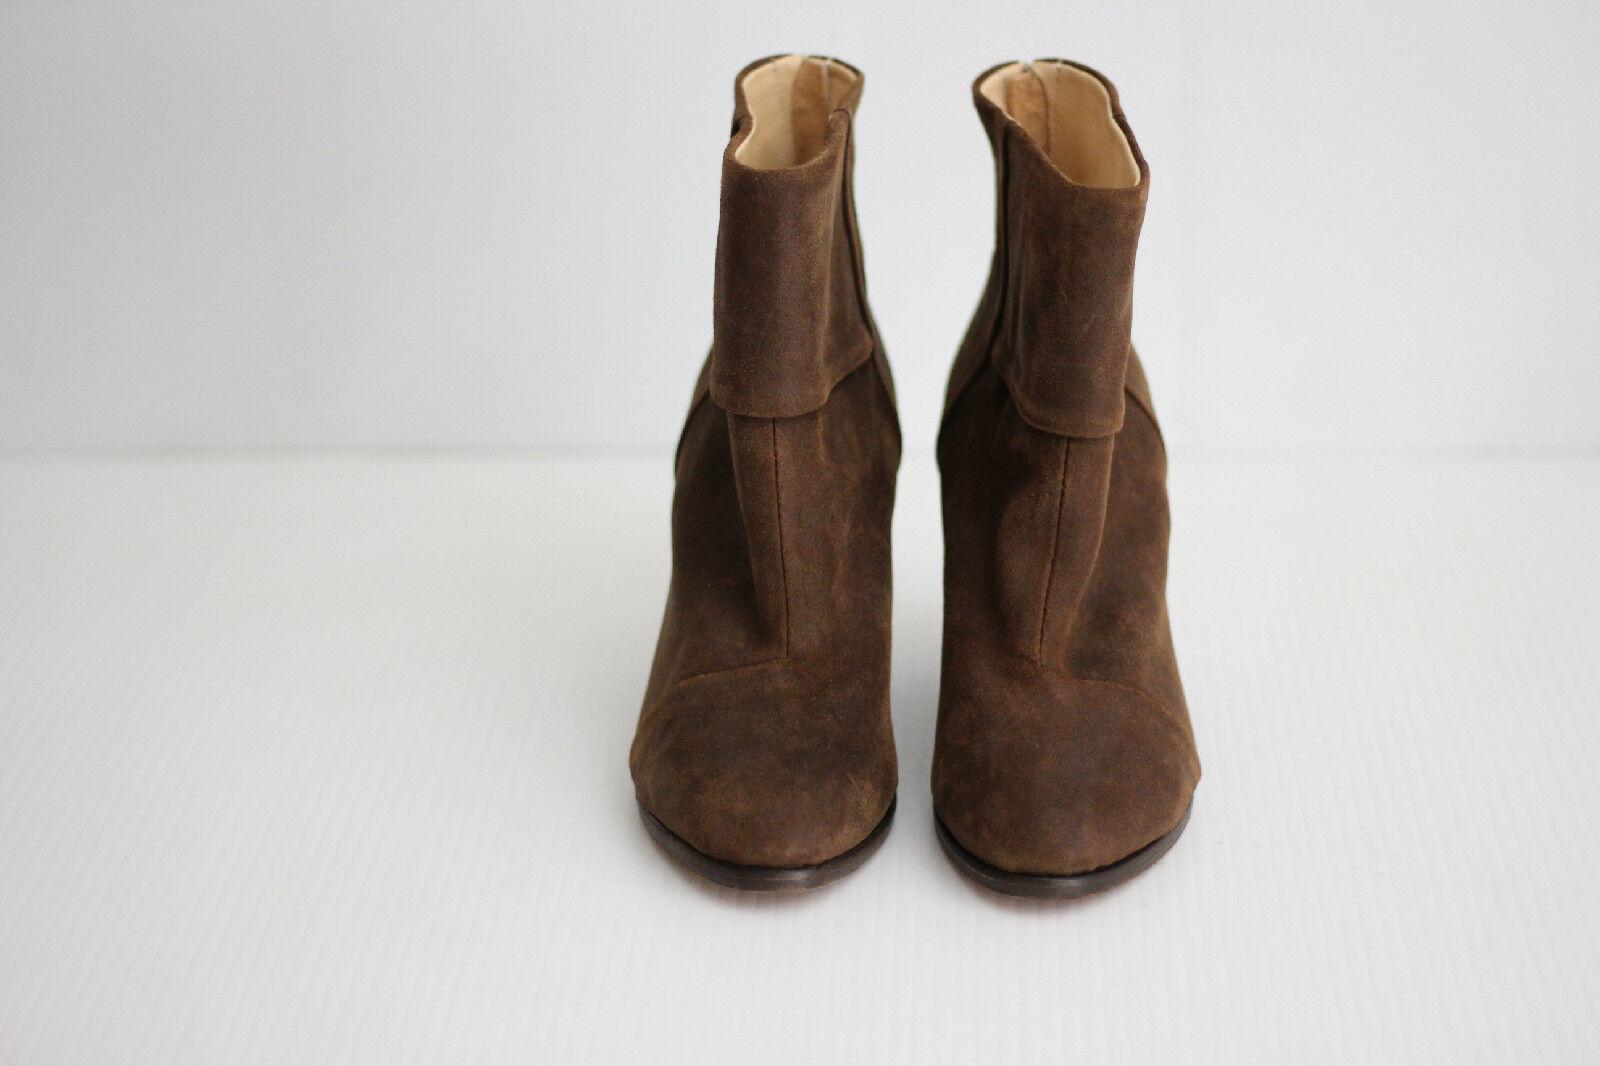 NEW Rag & Bone 'Newbury' Bootie - - - Brown Wax Suede - Size 36.5   6.5US  (S11) 32e25f